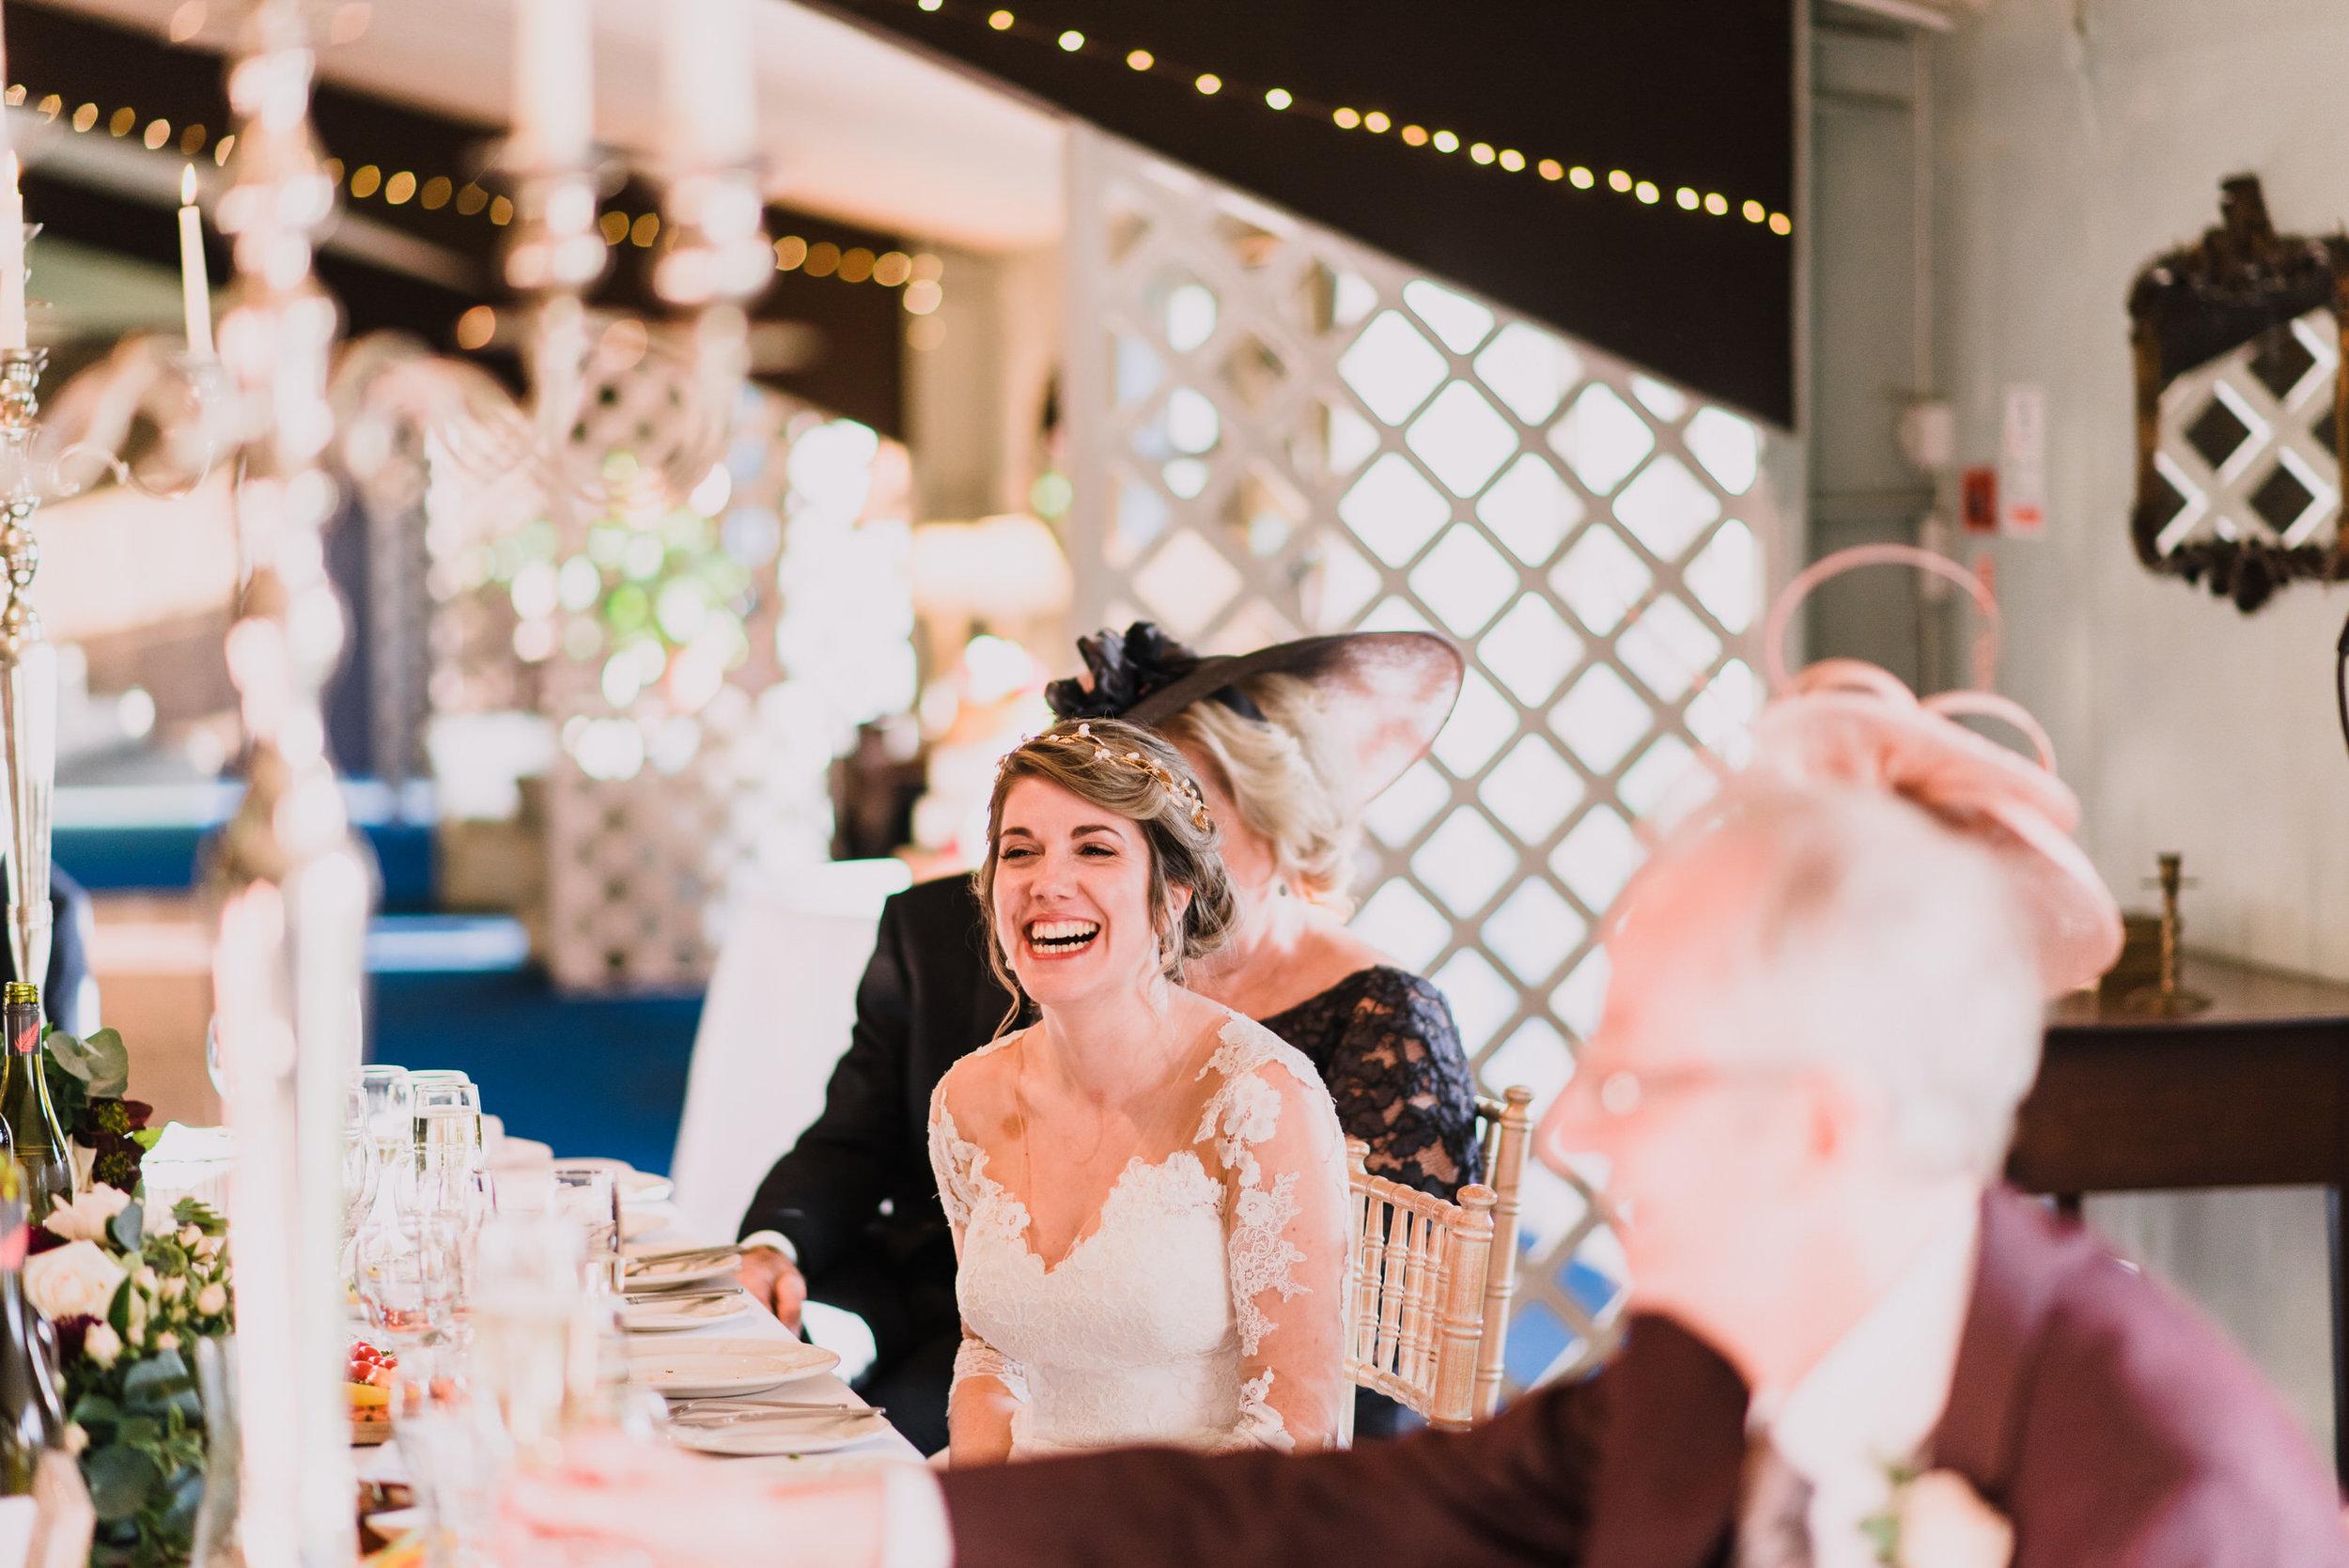 lissanoure castle wedding, northern ireland wedding photographer, romantic northern irish wedding venue, castle wedding ireland, natural wedding photography ni (114).jpg